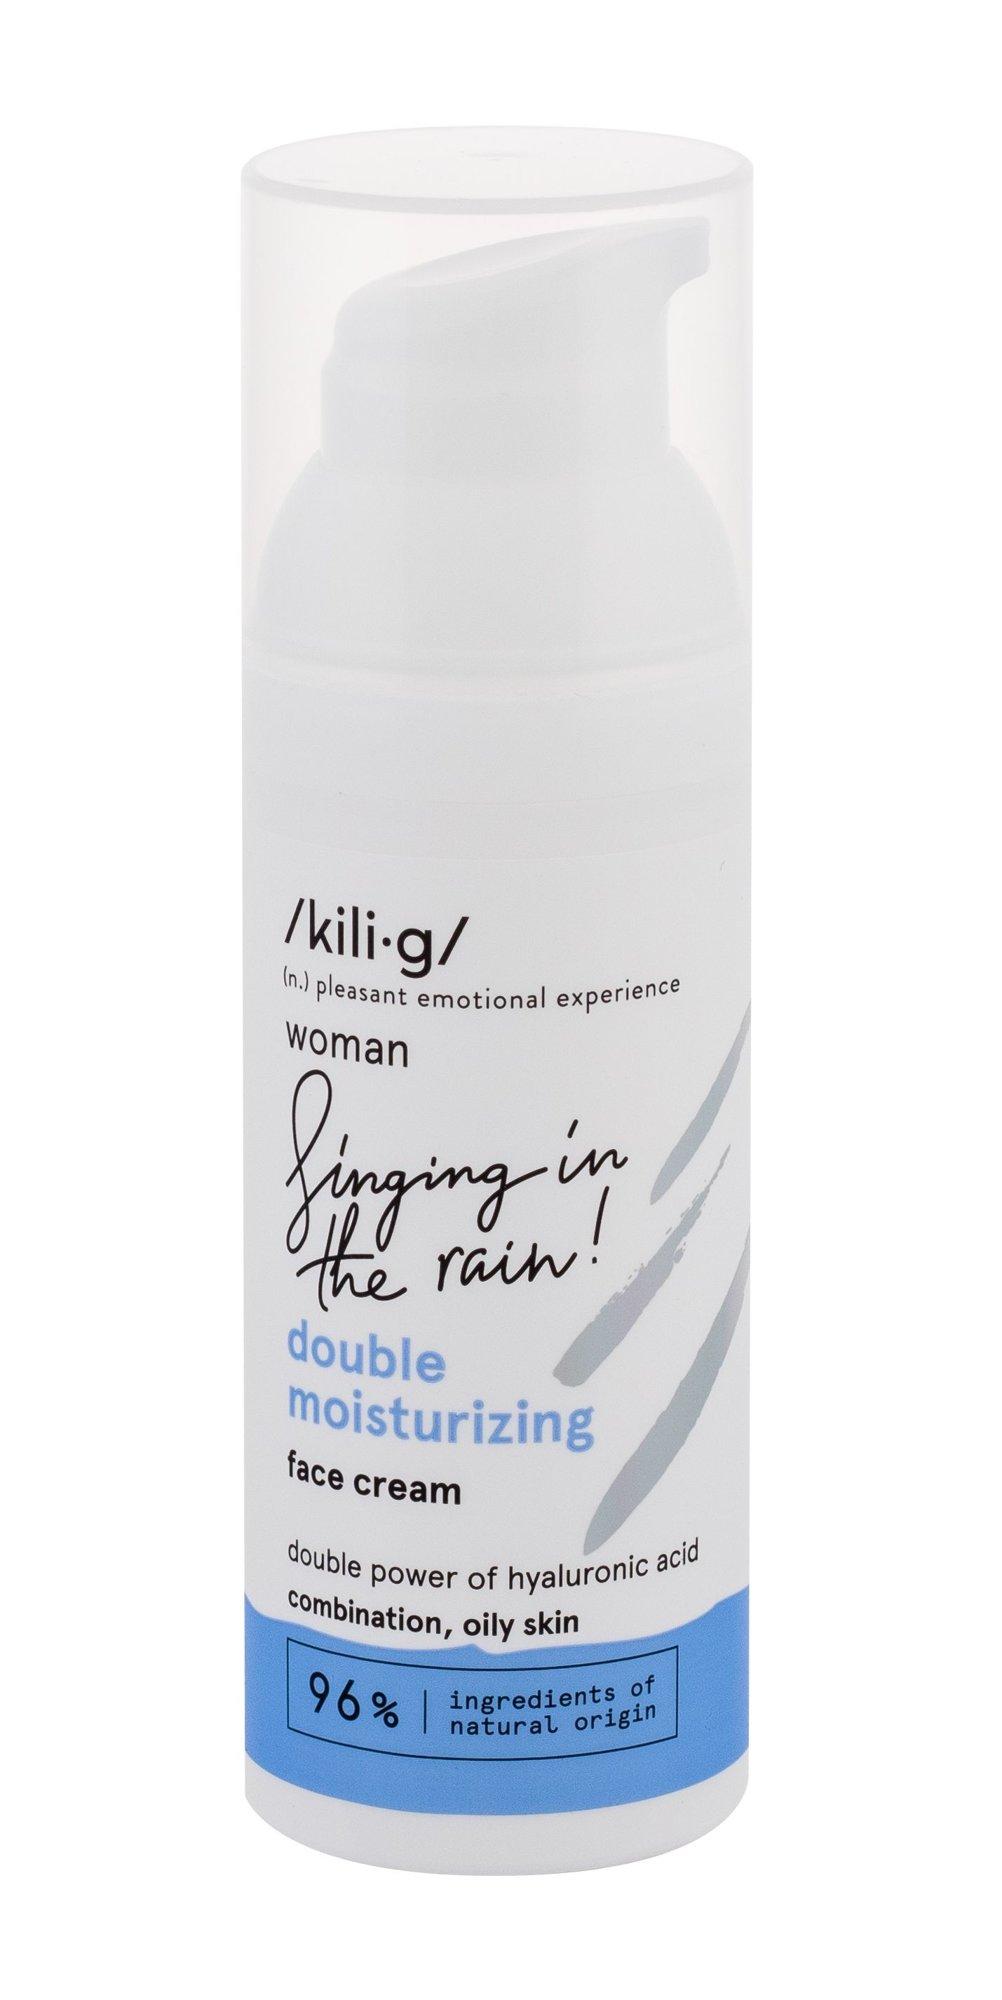 kili·g woman double moisturizing Day Cream 50ml